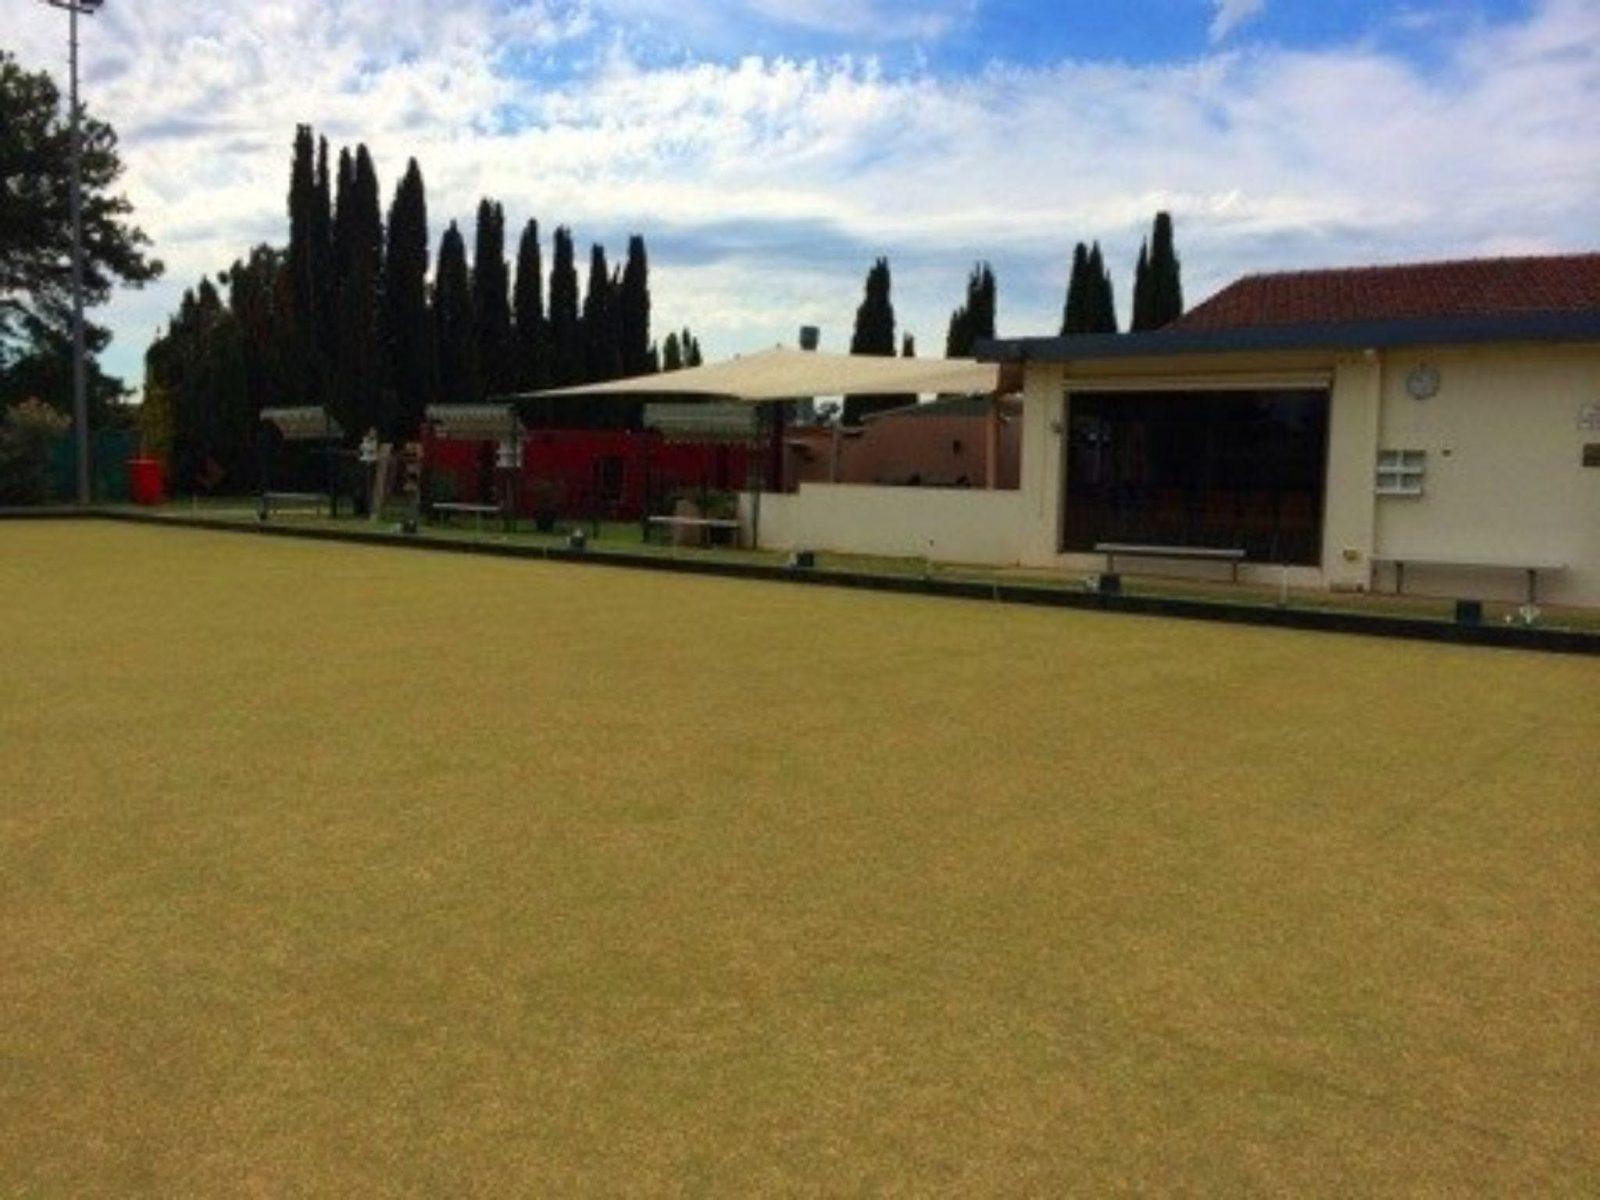 Lawn bowling field